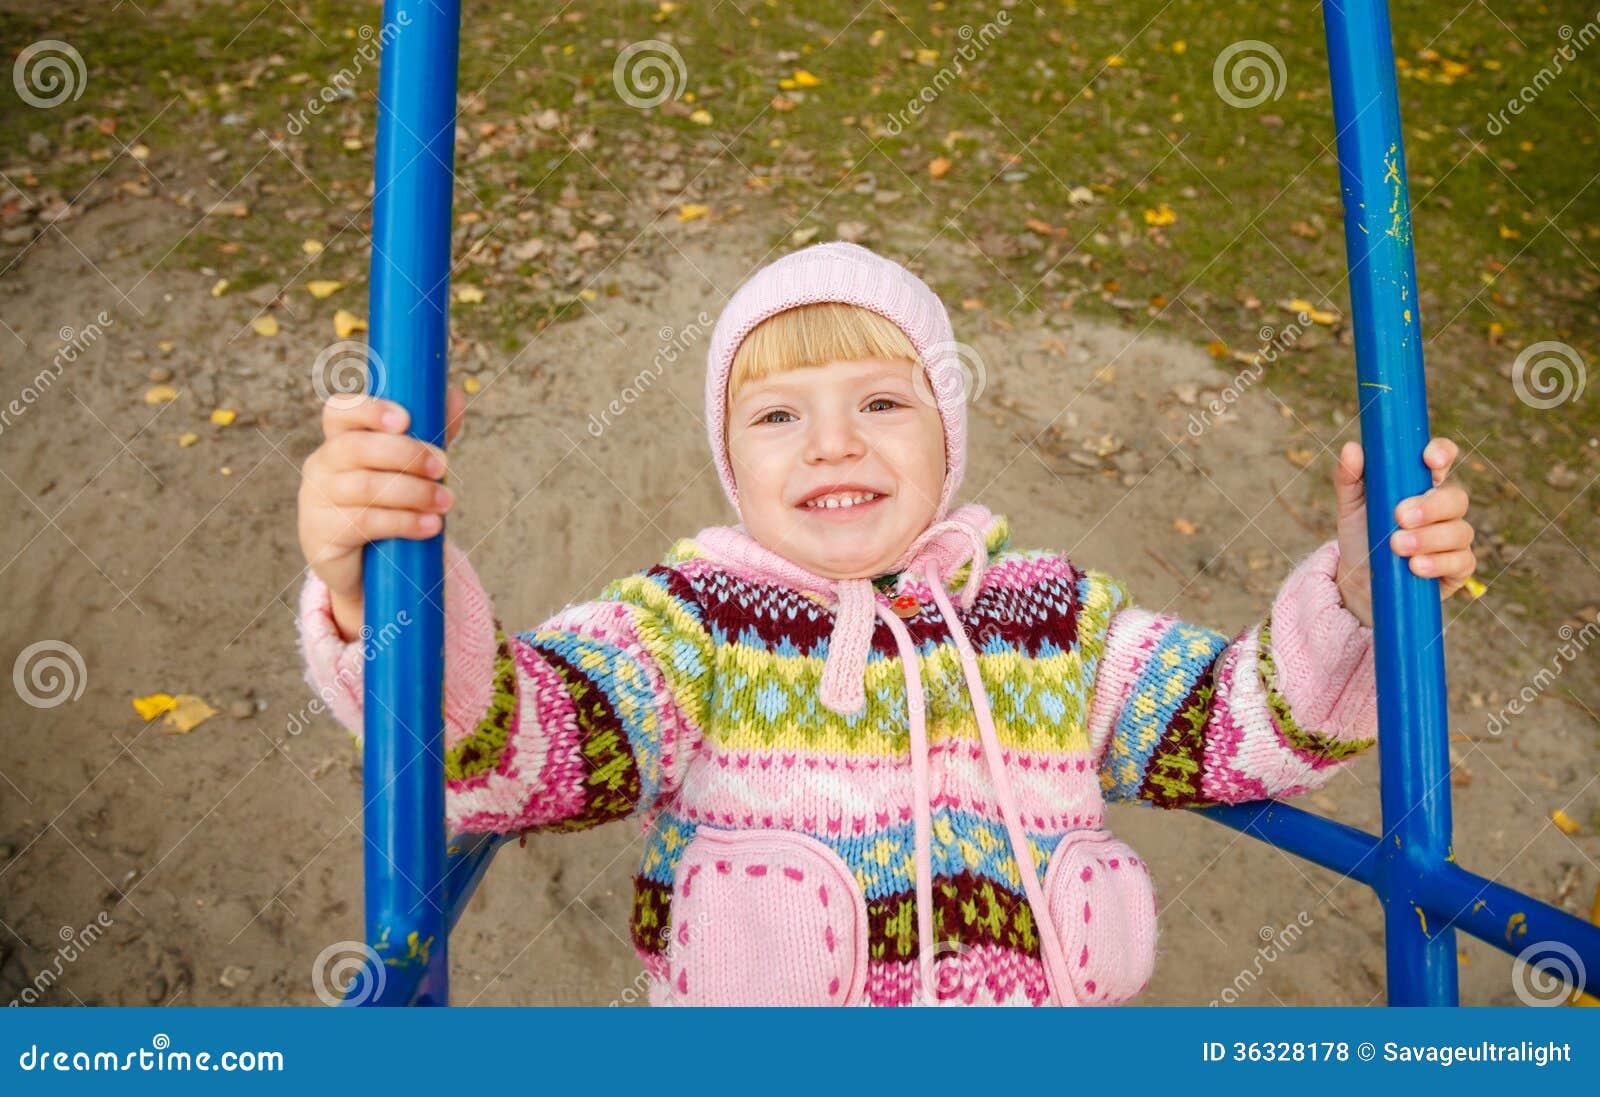 girl on swing above - photo #22